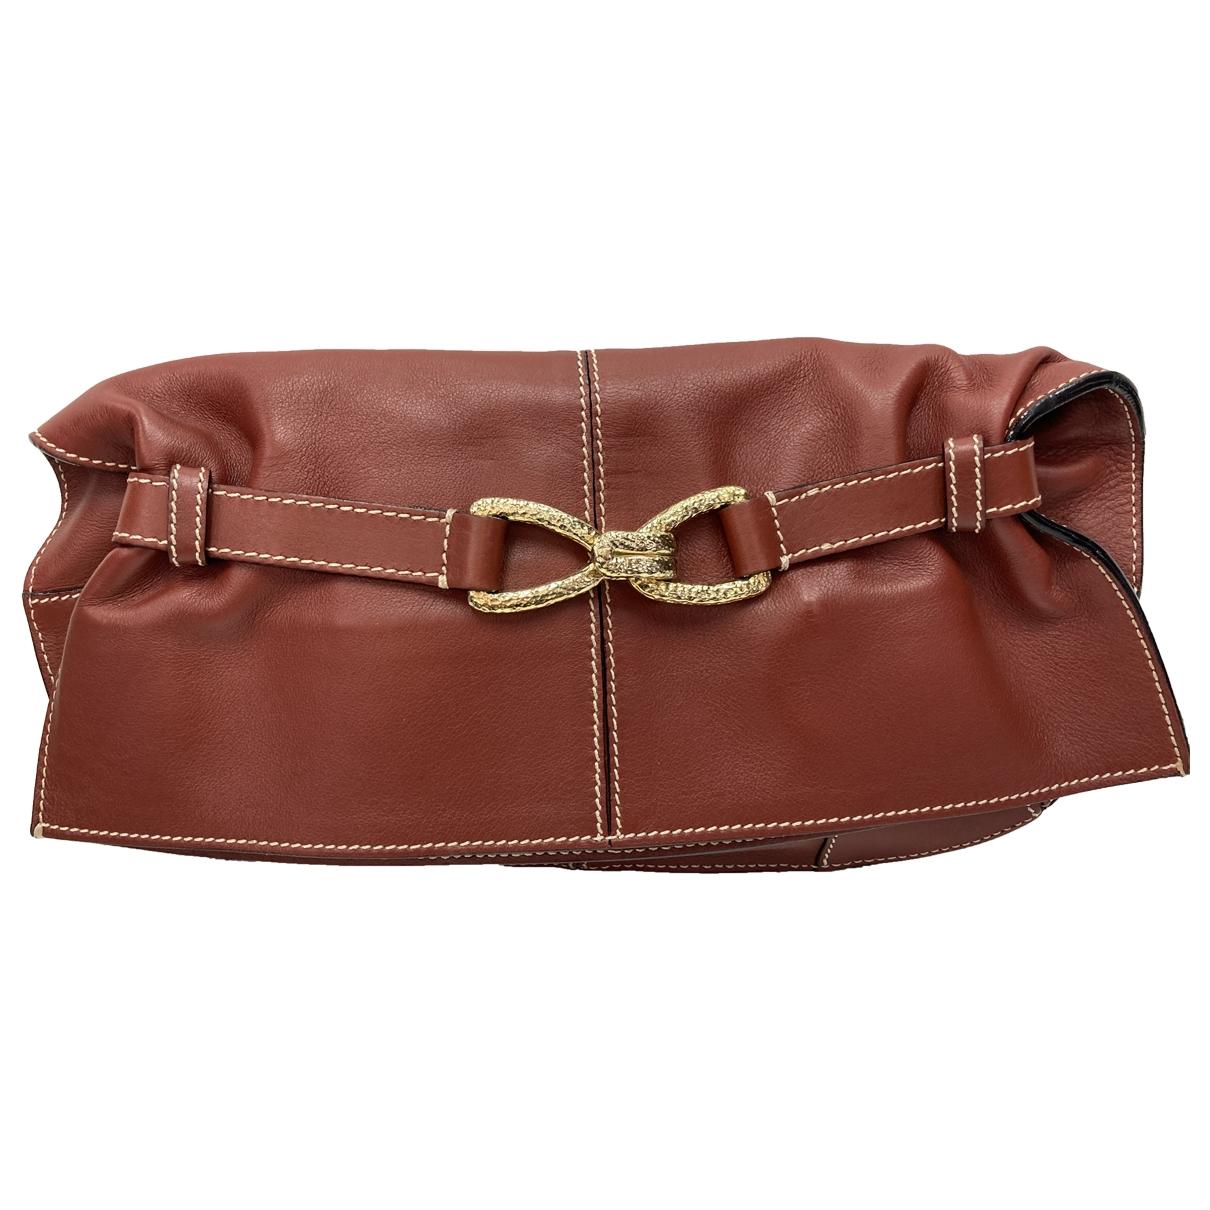 Roberto Cavalli \N Brown Leather Clutch bag for Women \N